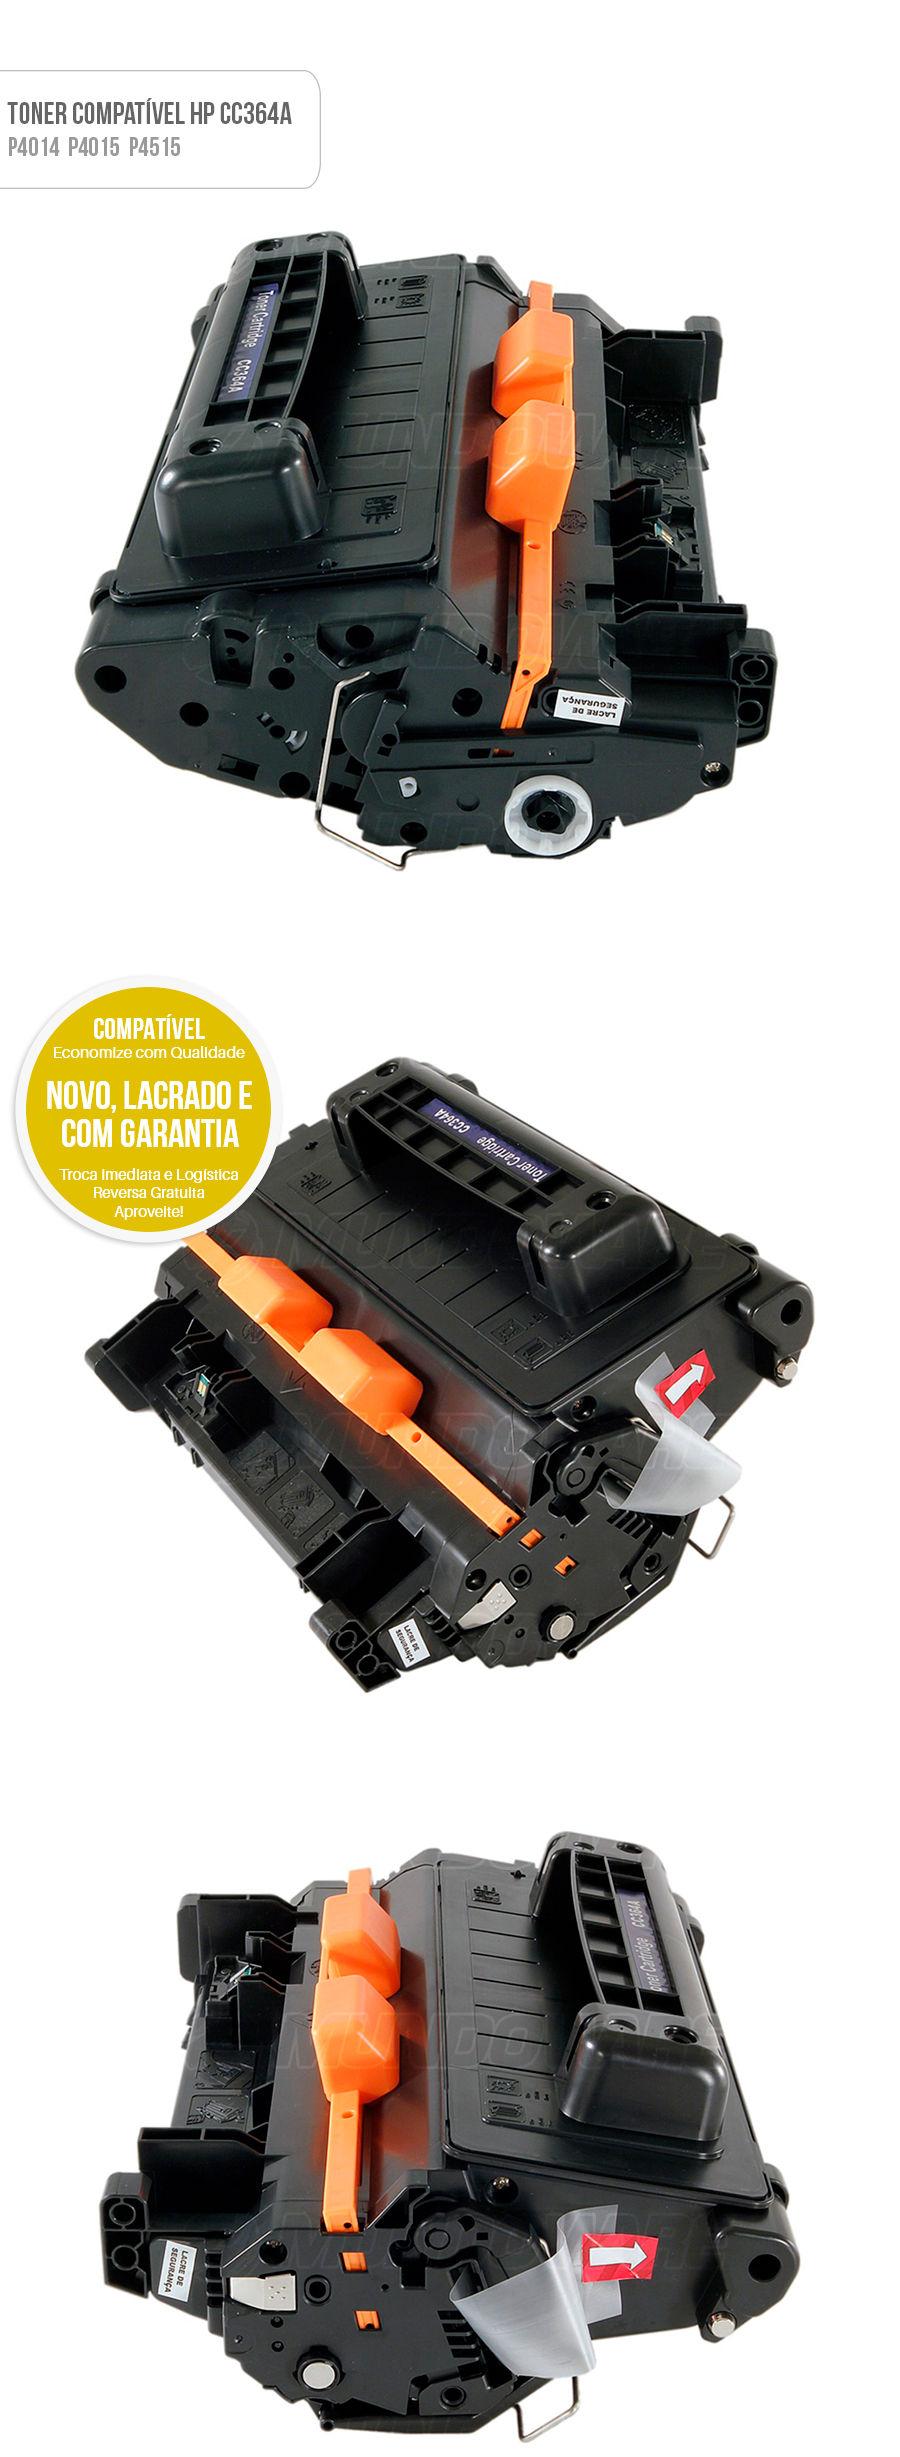 Toner Compativel para P4014 P4014N P4014DN P4015 P4015X P4015N P4015TN P4015DN P4515 P4515N P4515X P4515TN P4515DN P4515XM